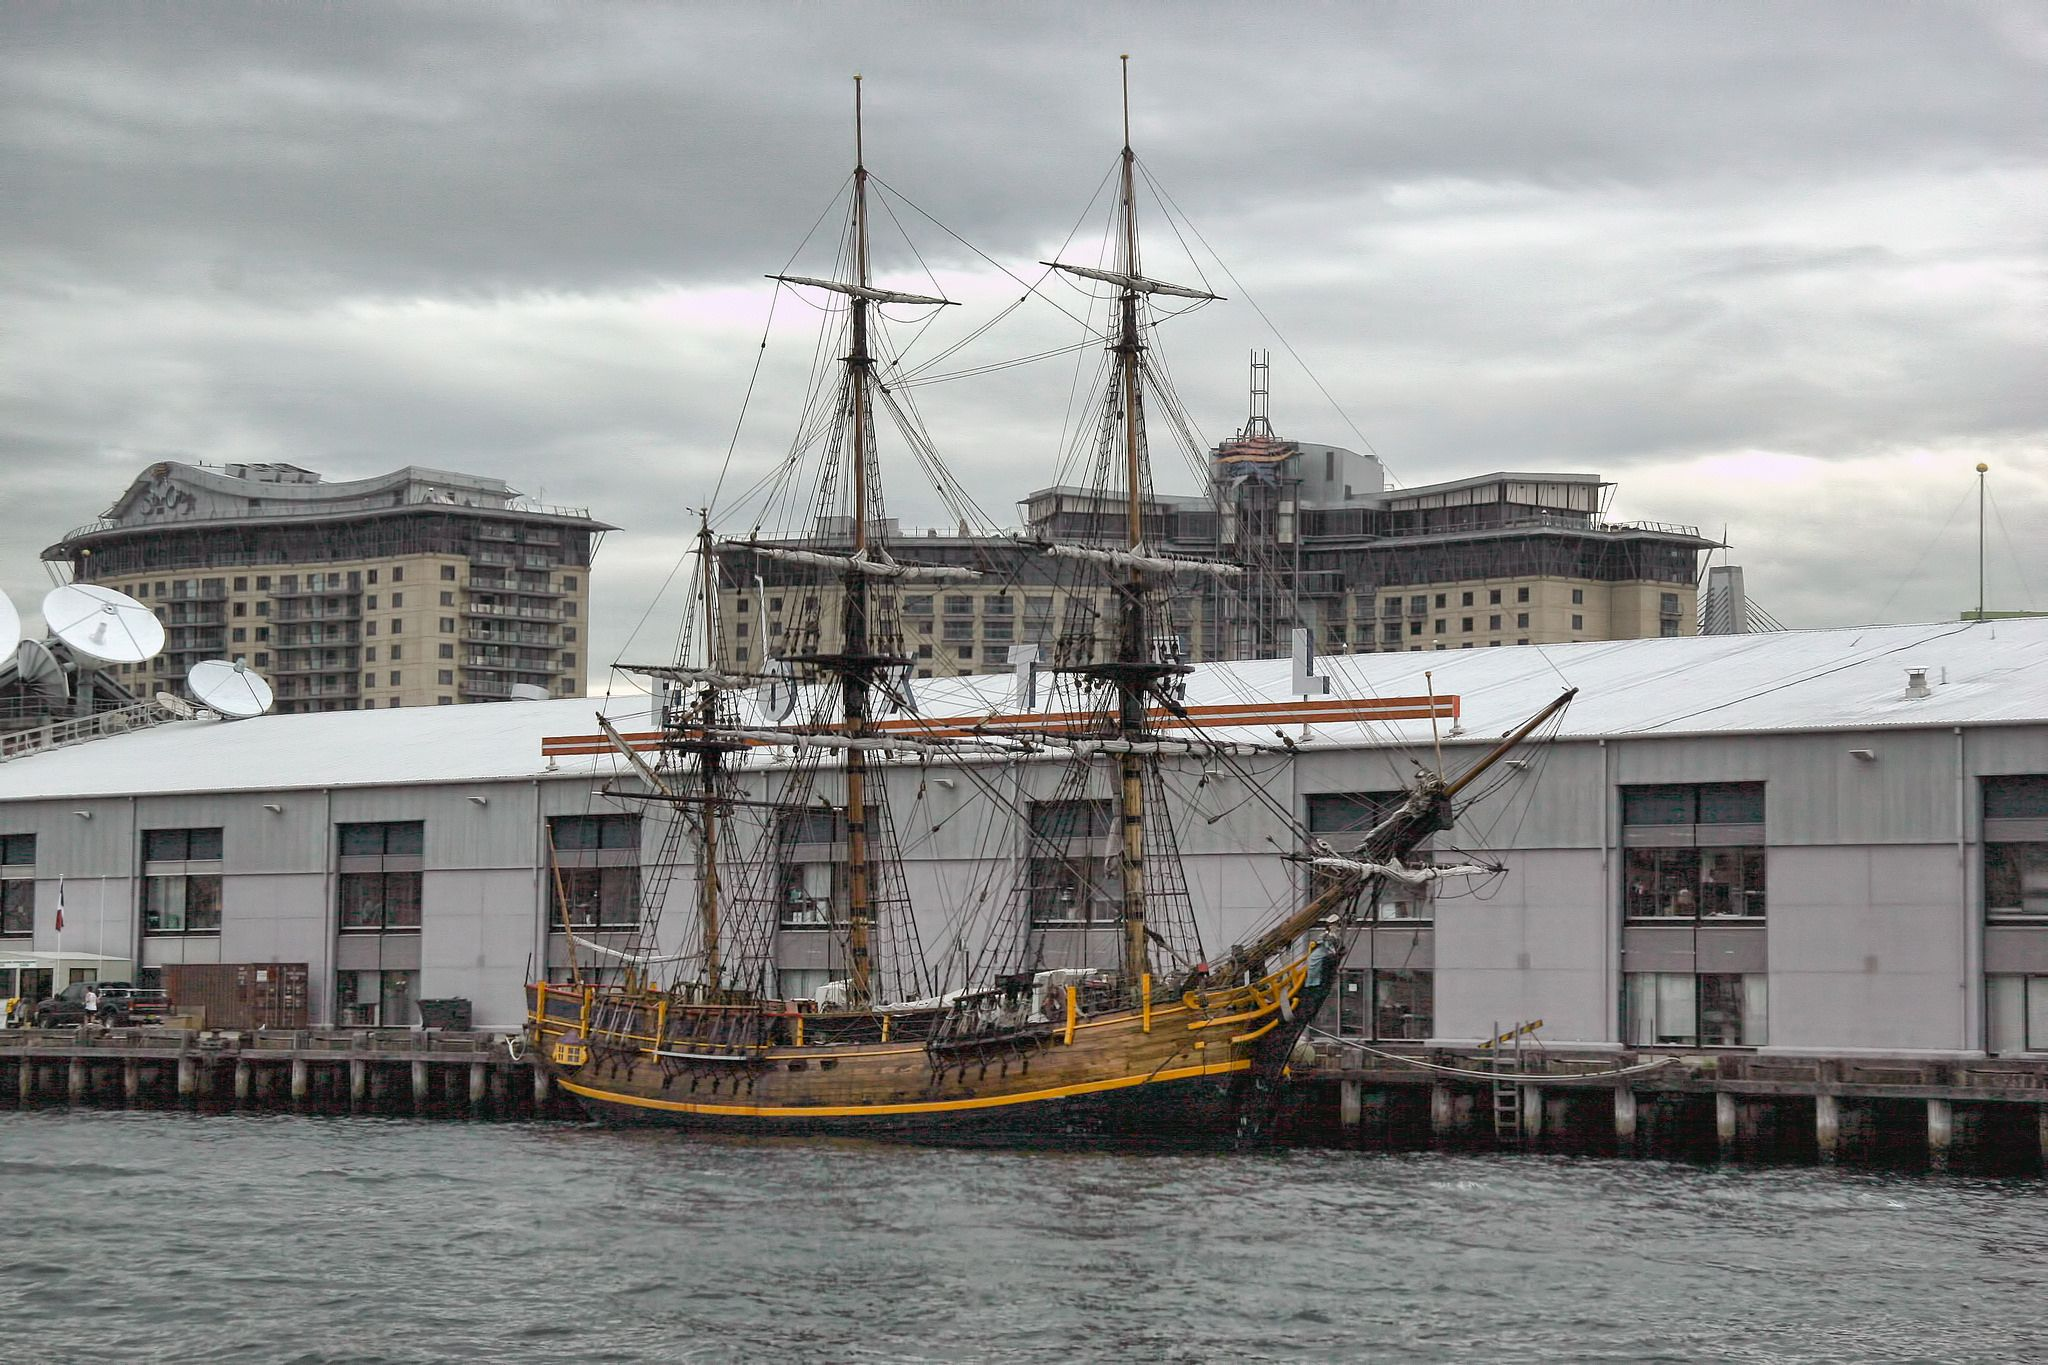 https://flic.kr/p/rdFpwJ | 보기좋은 옛날 배 : Show good old ship | 이런 것들을 보면 우리와는 다른 정서나 구성이 보인다. 식민지 시대의 정서와 함께.